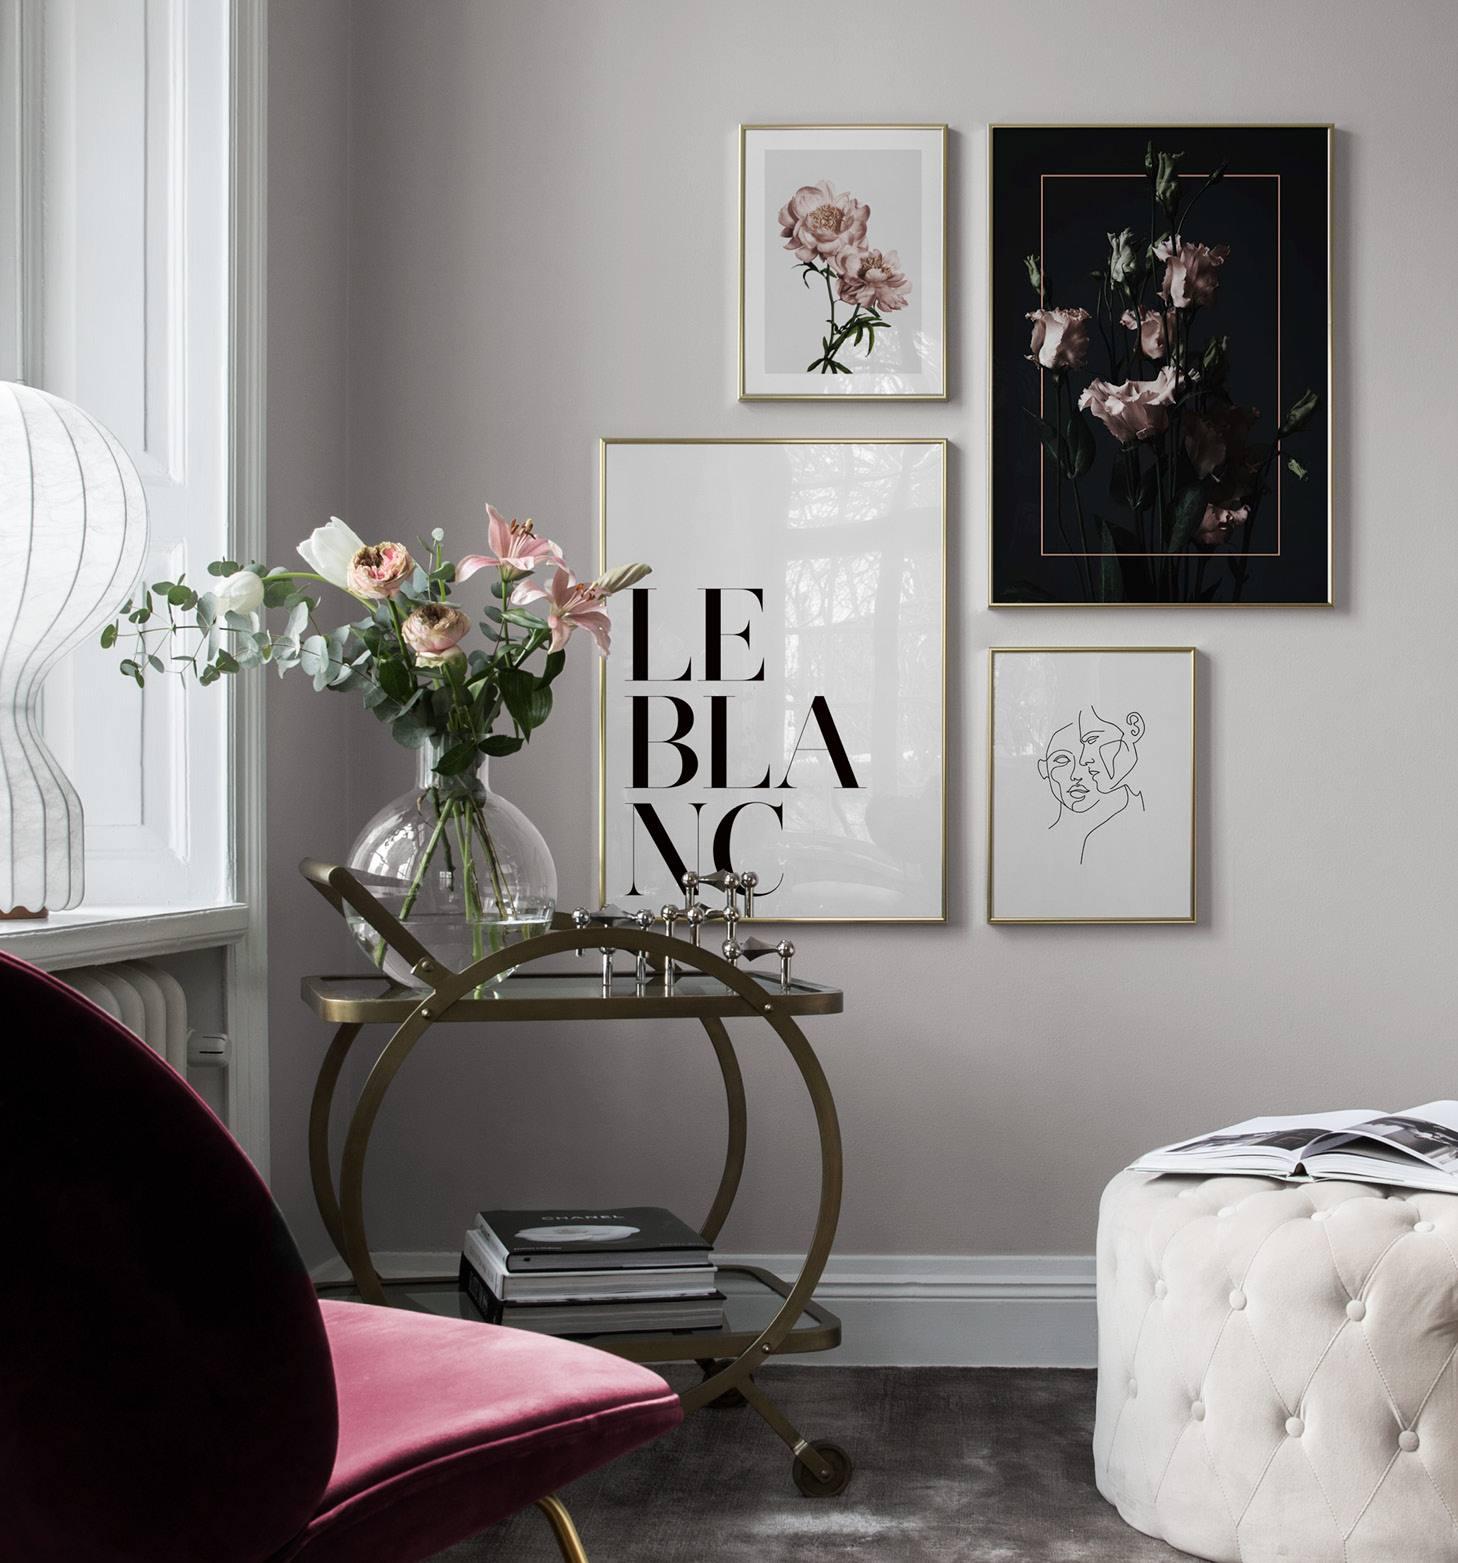 Elegant vardagsrum med ljusrosa blommor